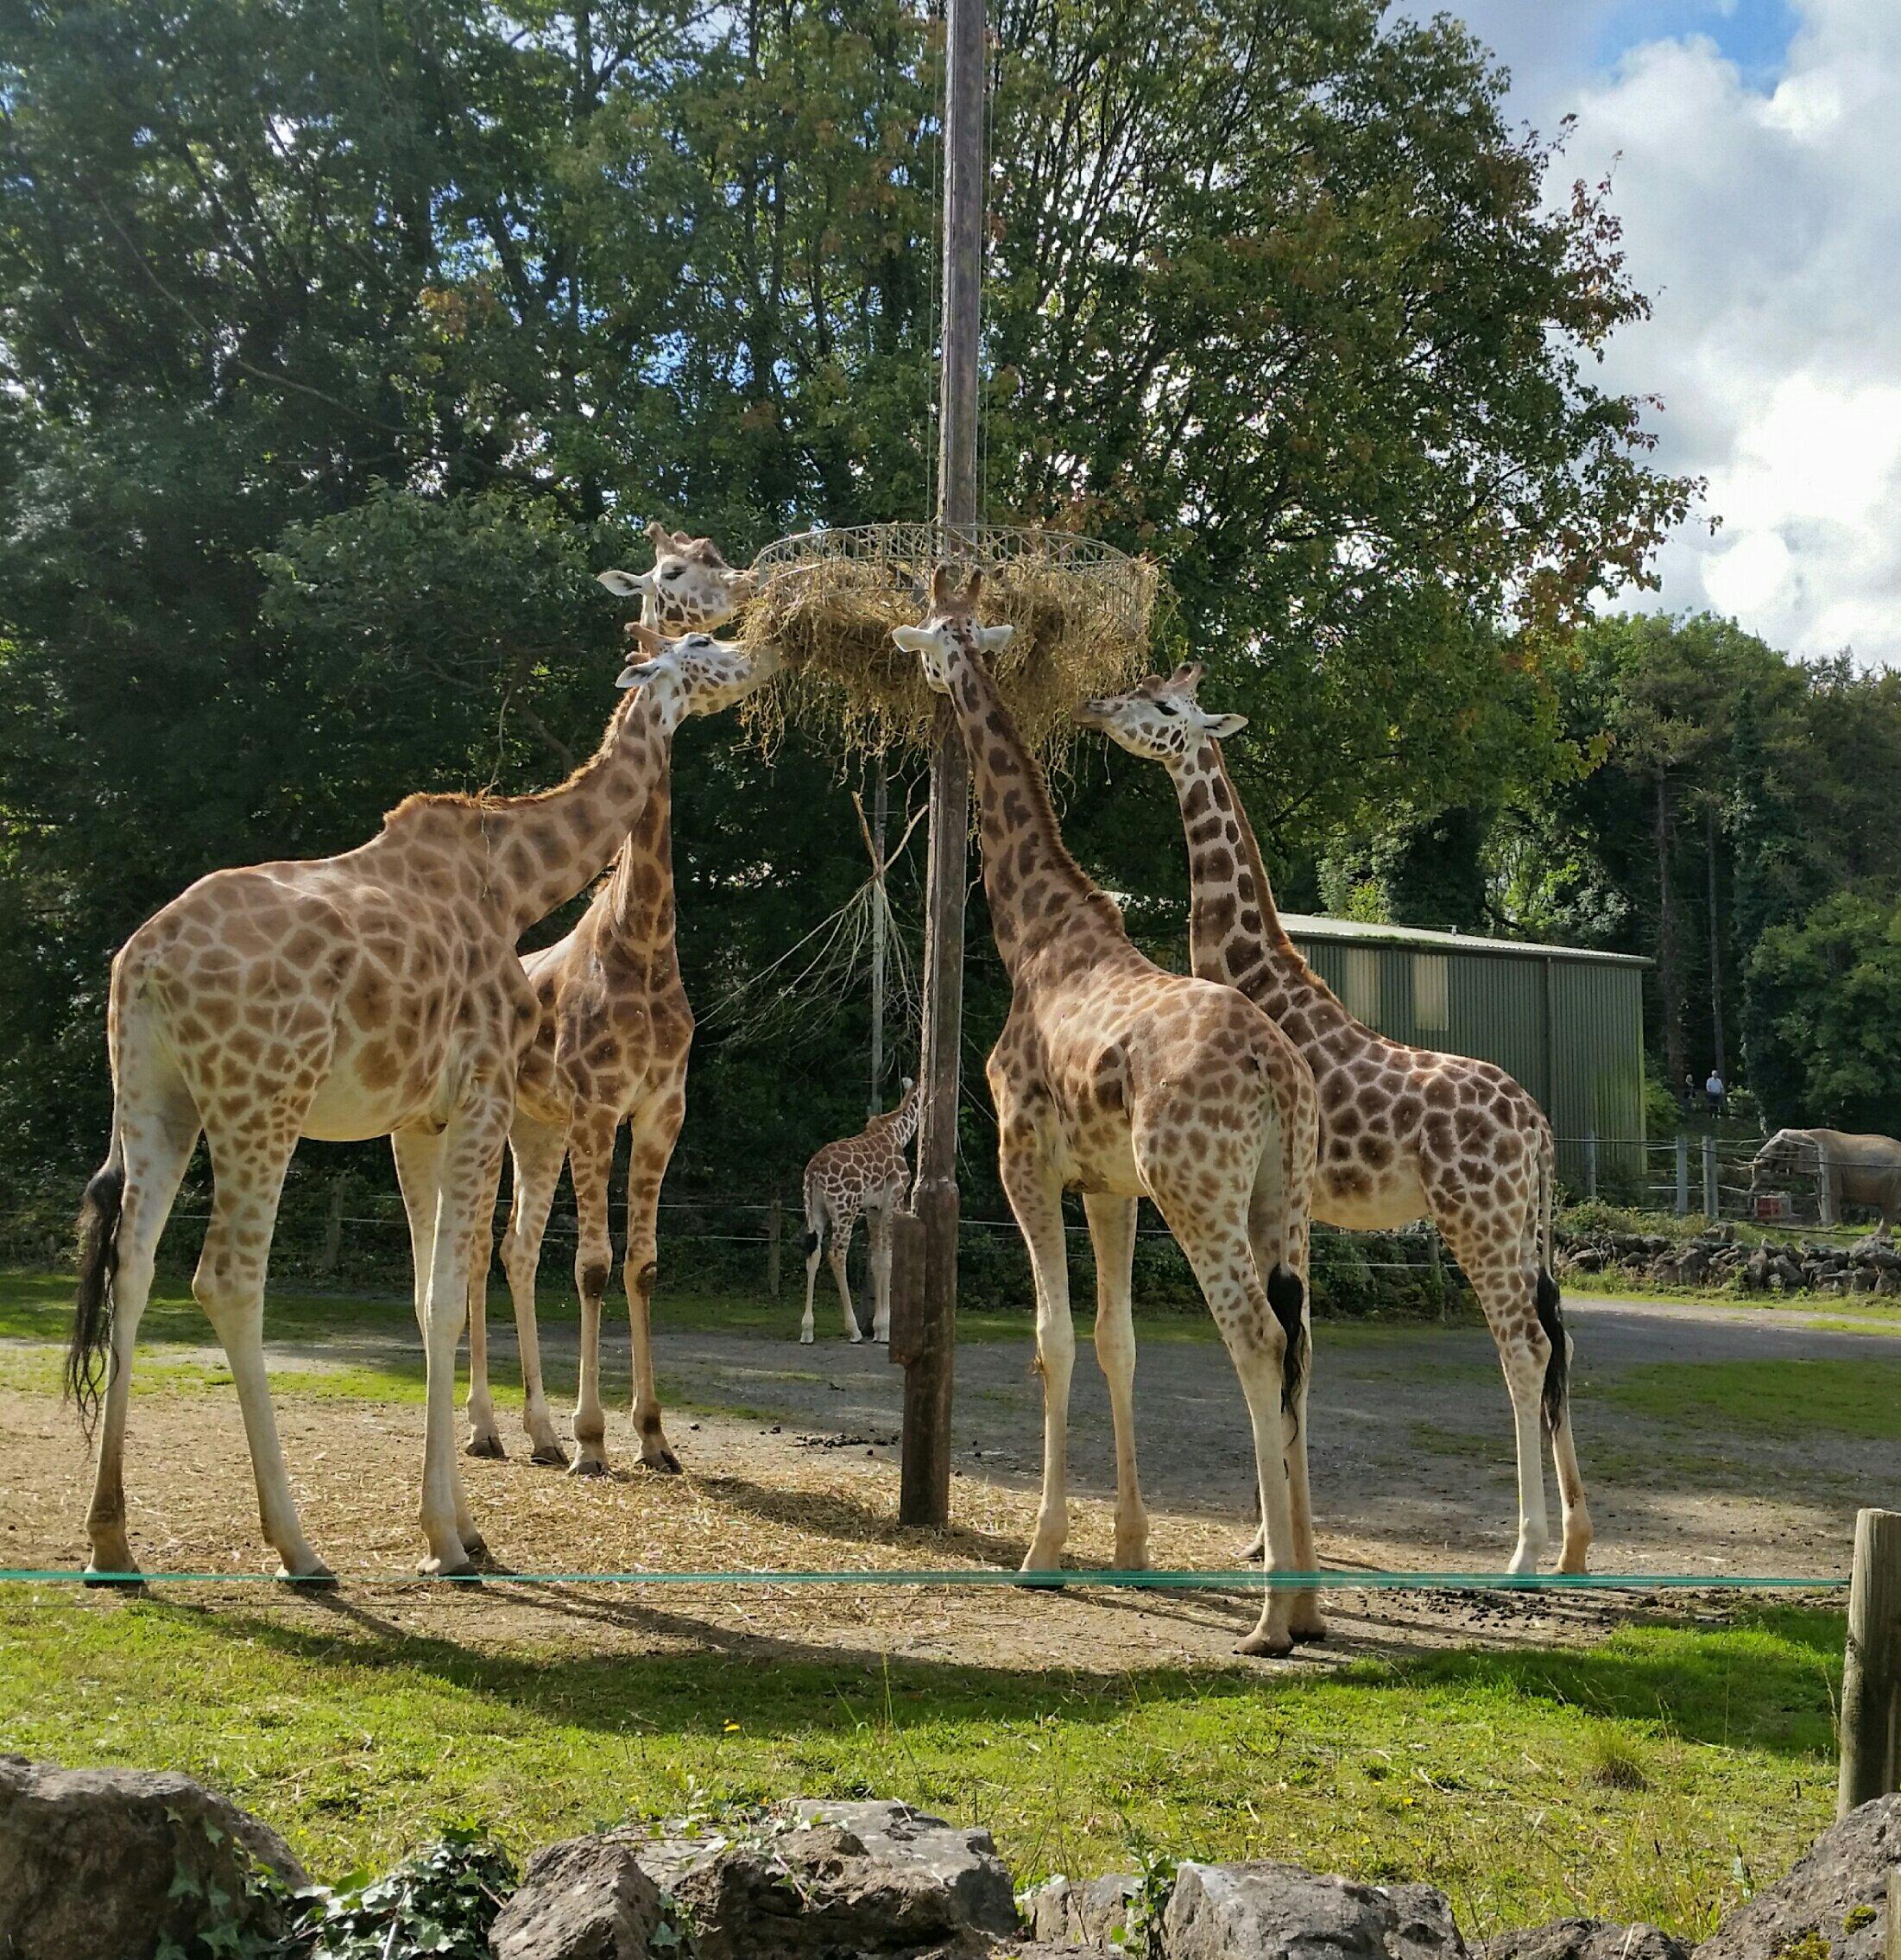 Giraffes photograph taken at Paingnton zoo in Devon